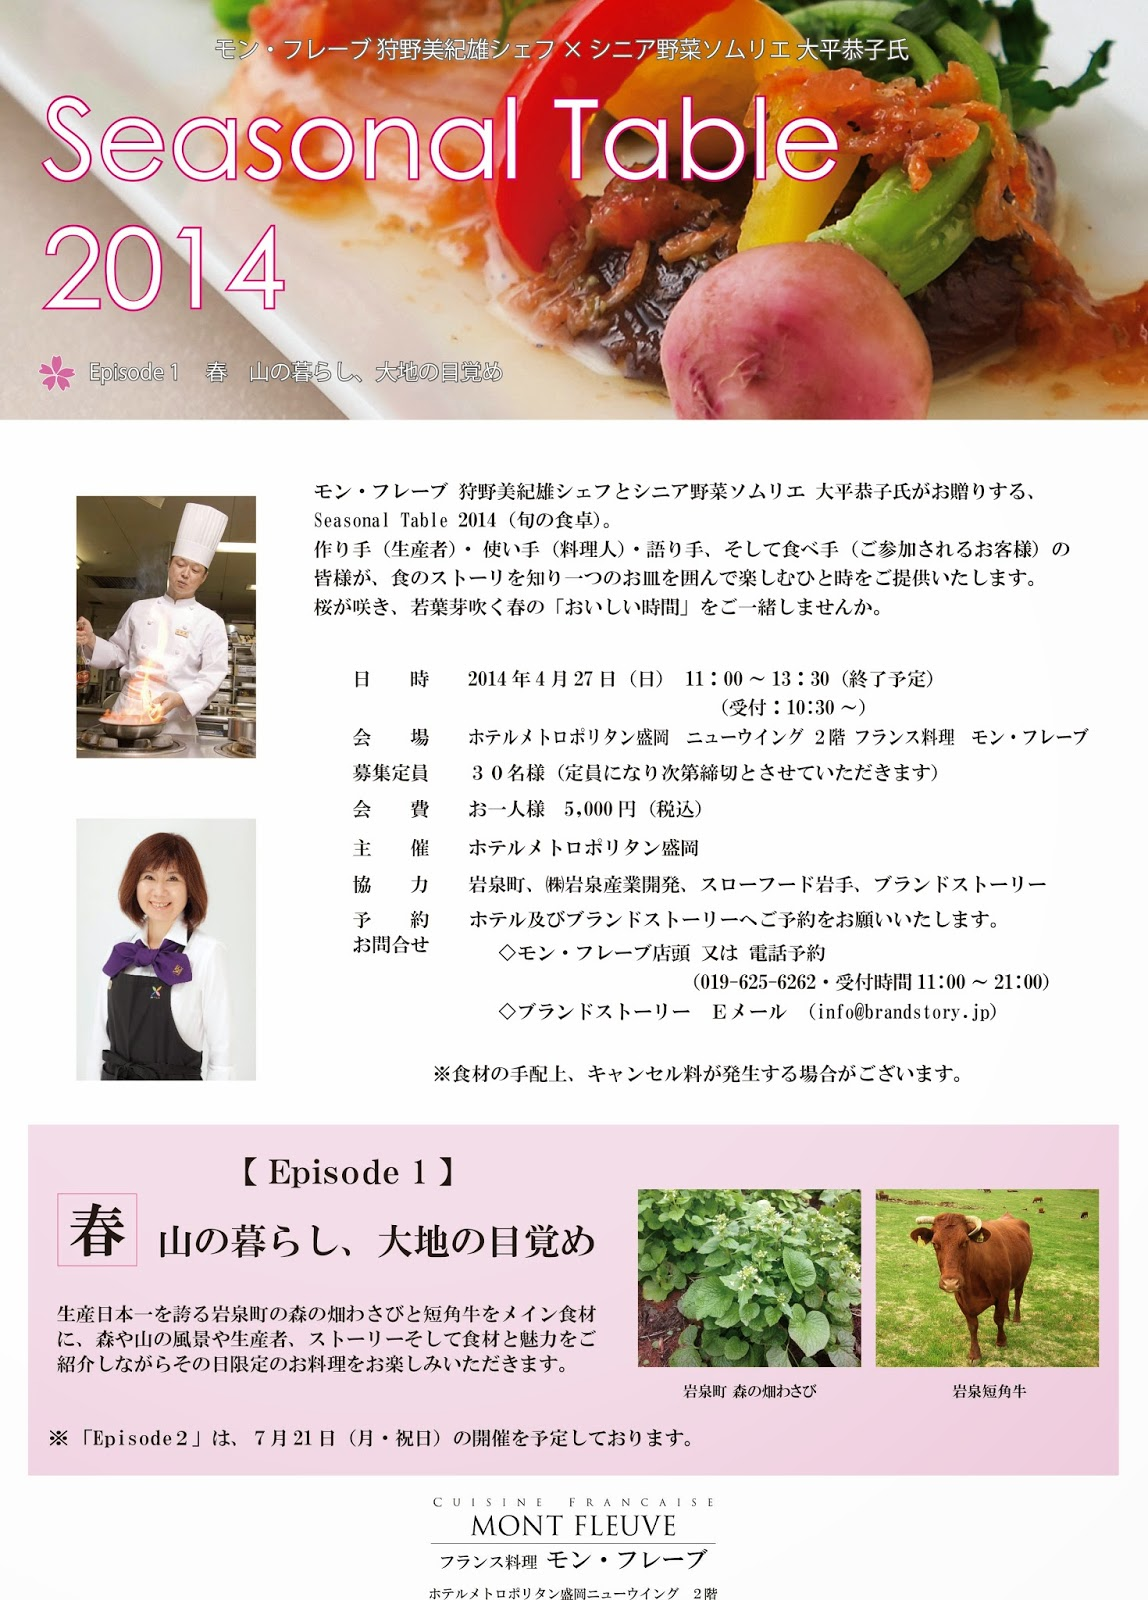 http://www.metro-morioka.co.jp/newwing/restaurant_mont_lunch.html